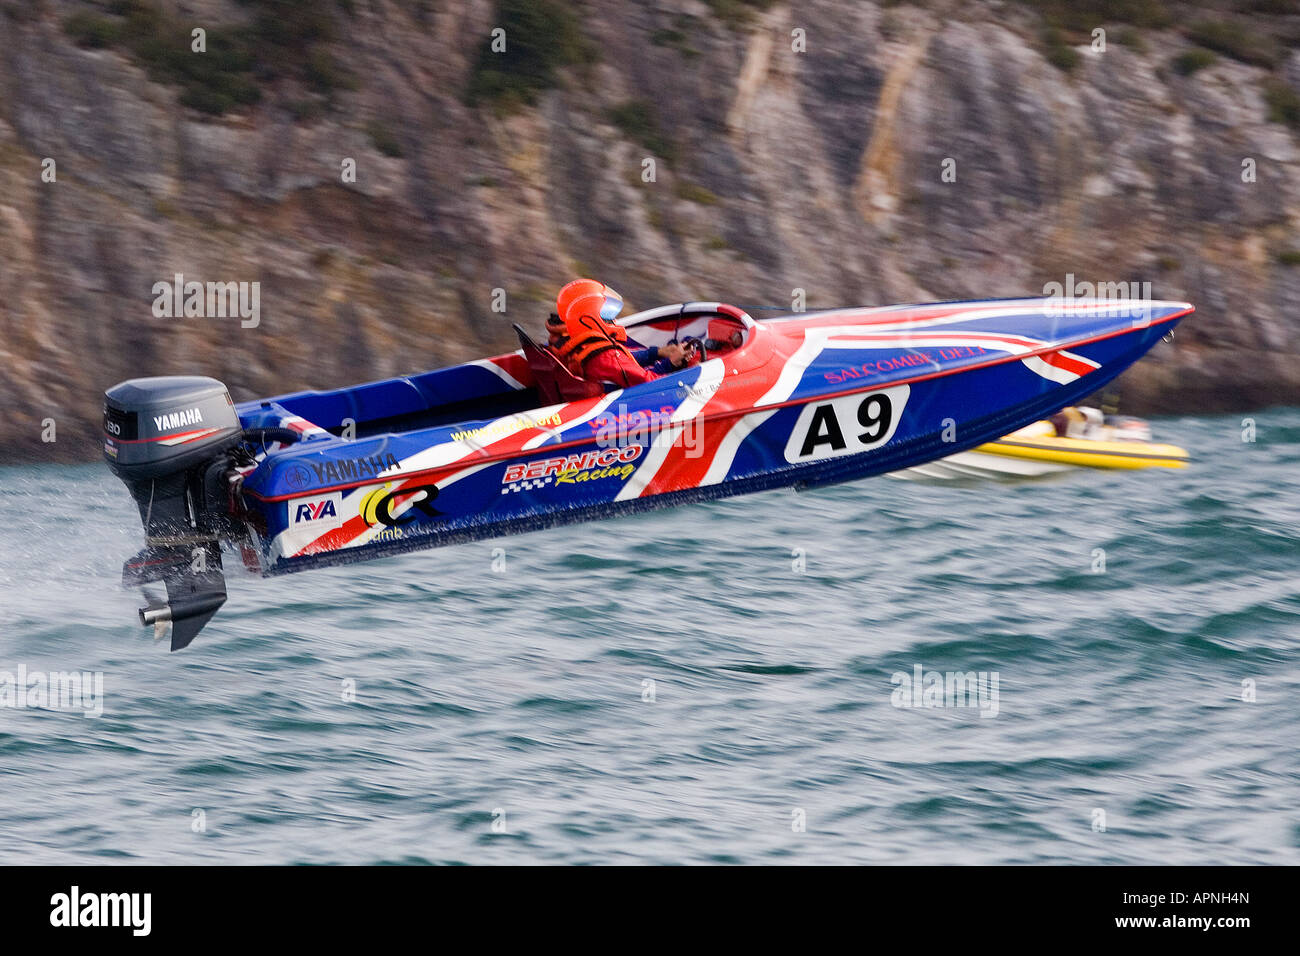 Offshore Circuit Racing Bernico No. A9 Racing at Torquay England - Stock Image